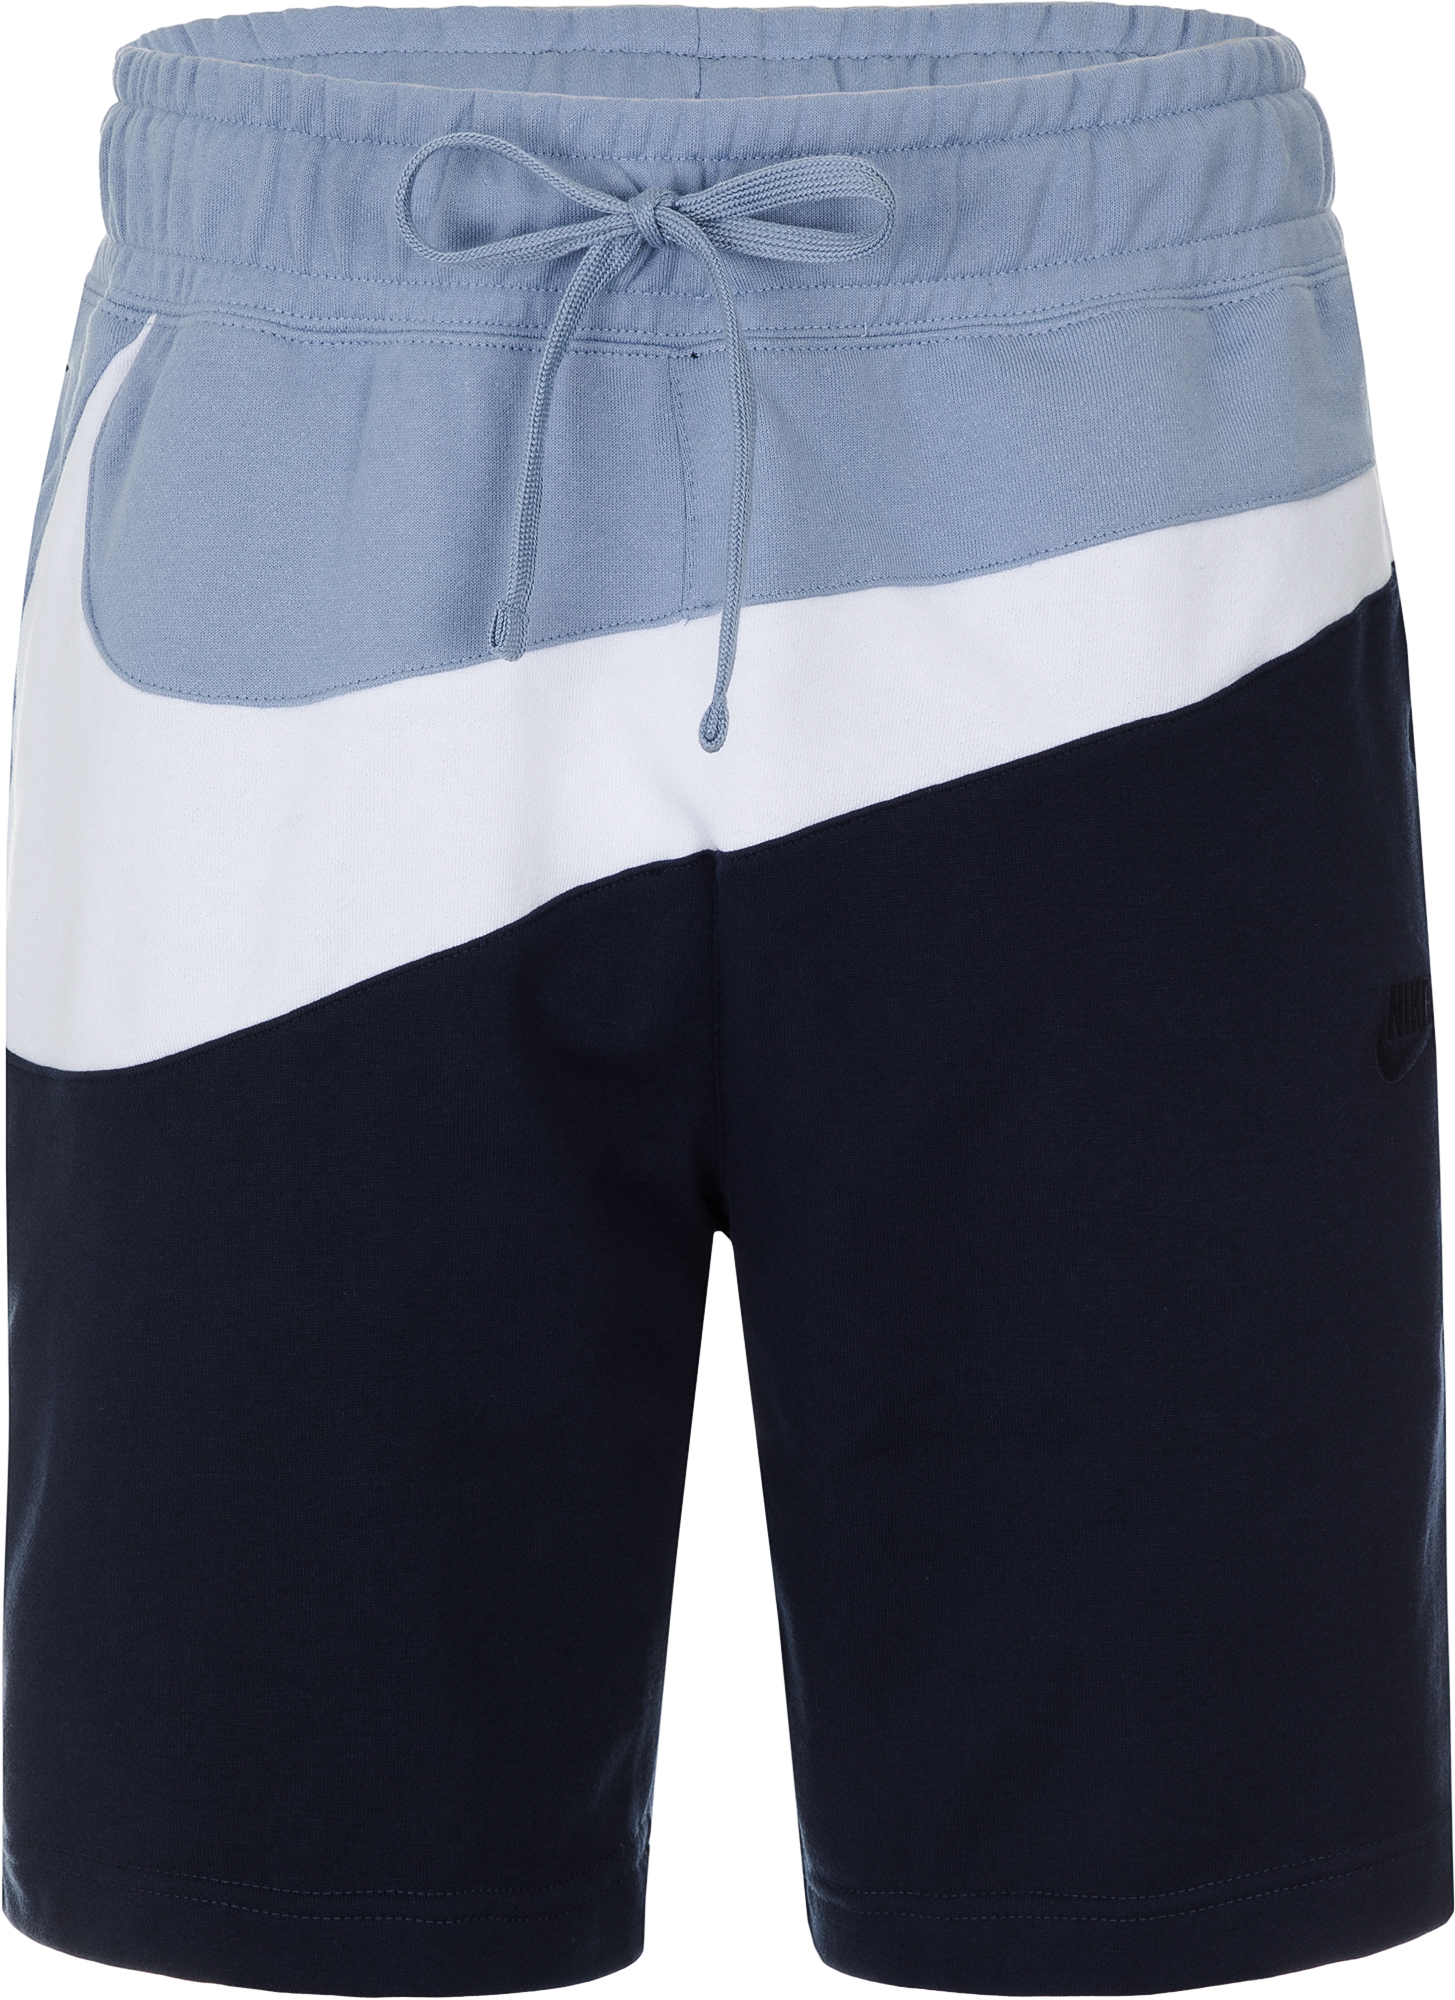 Nike Шорты мужские Nike, размер 50-52